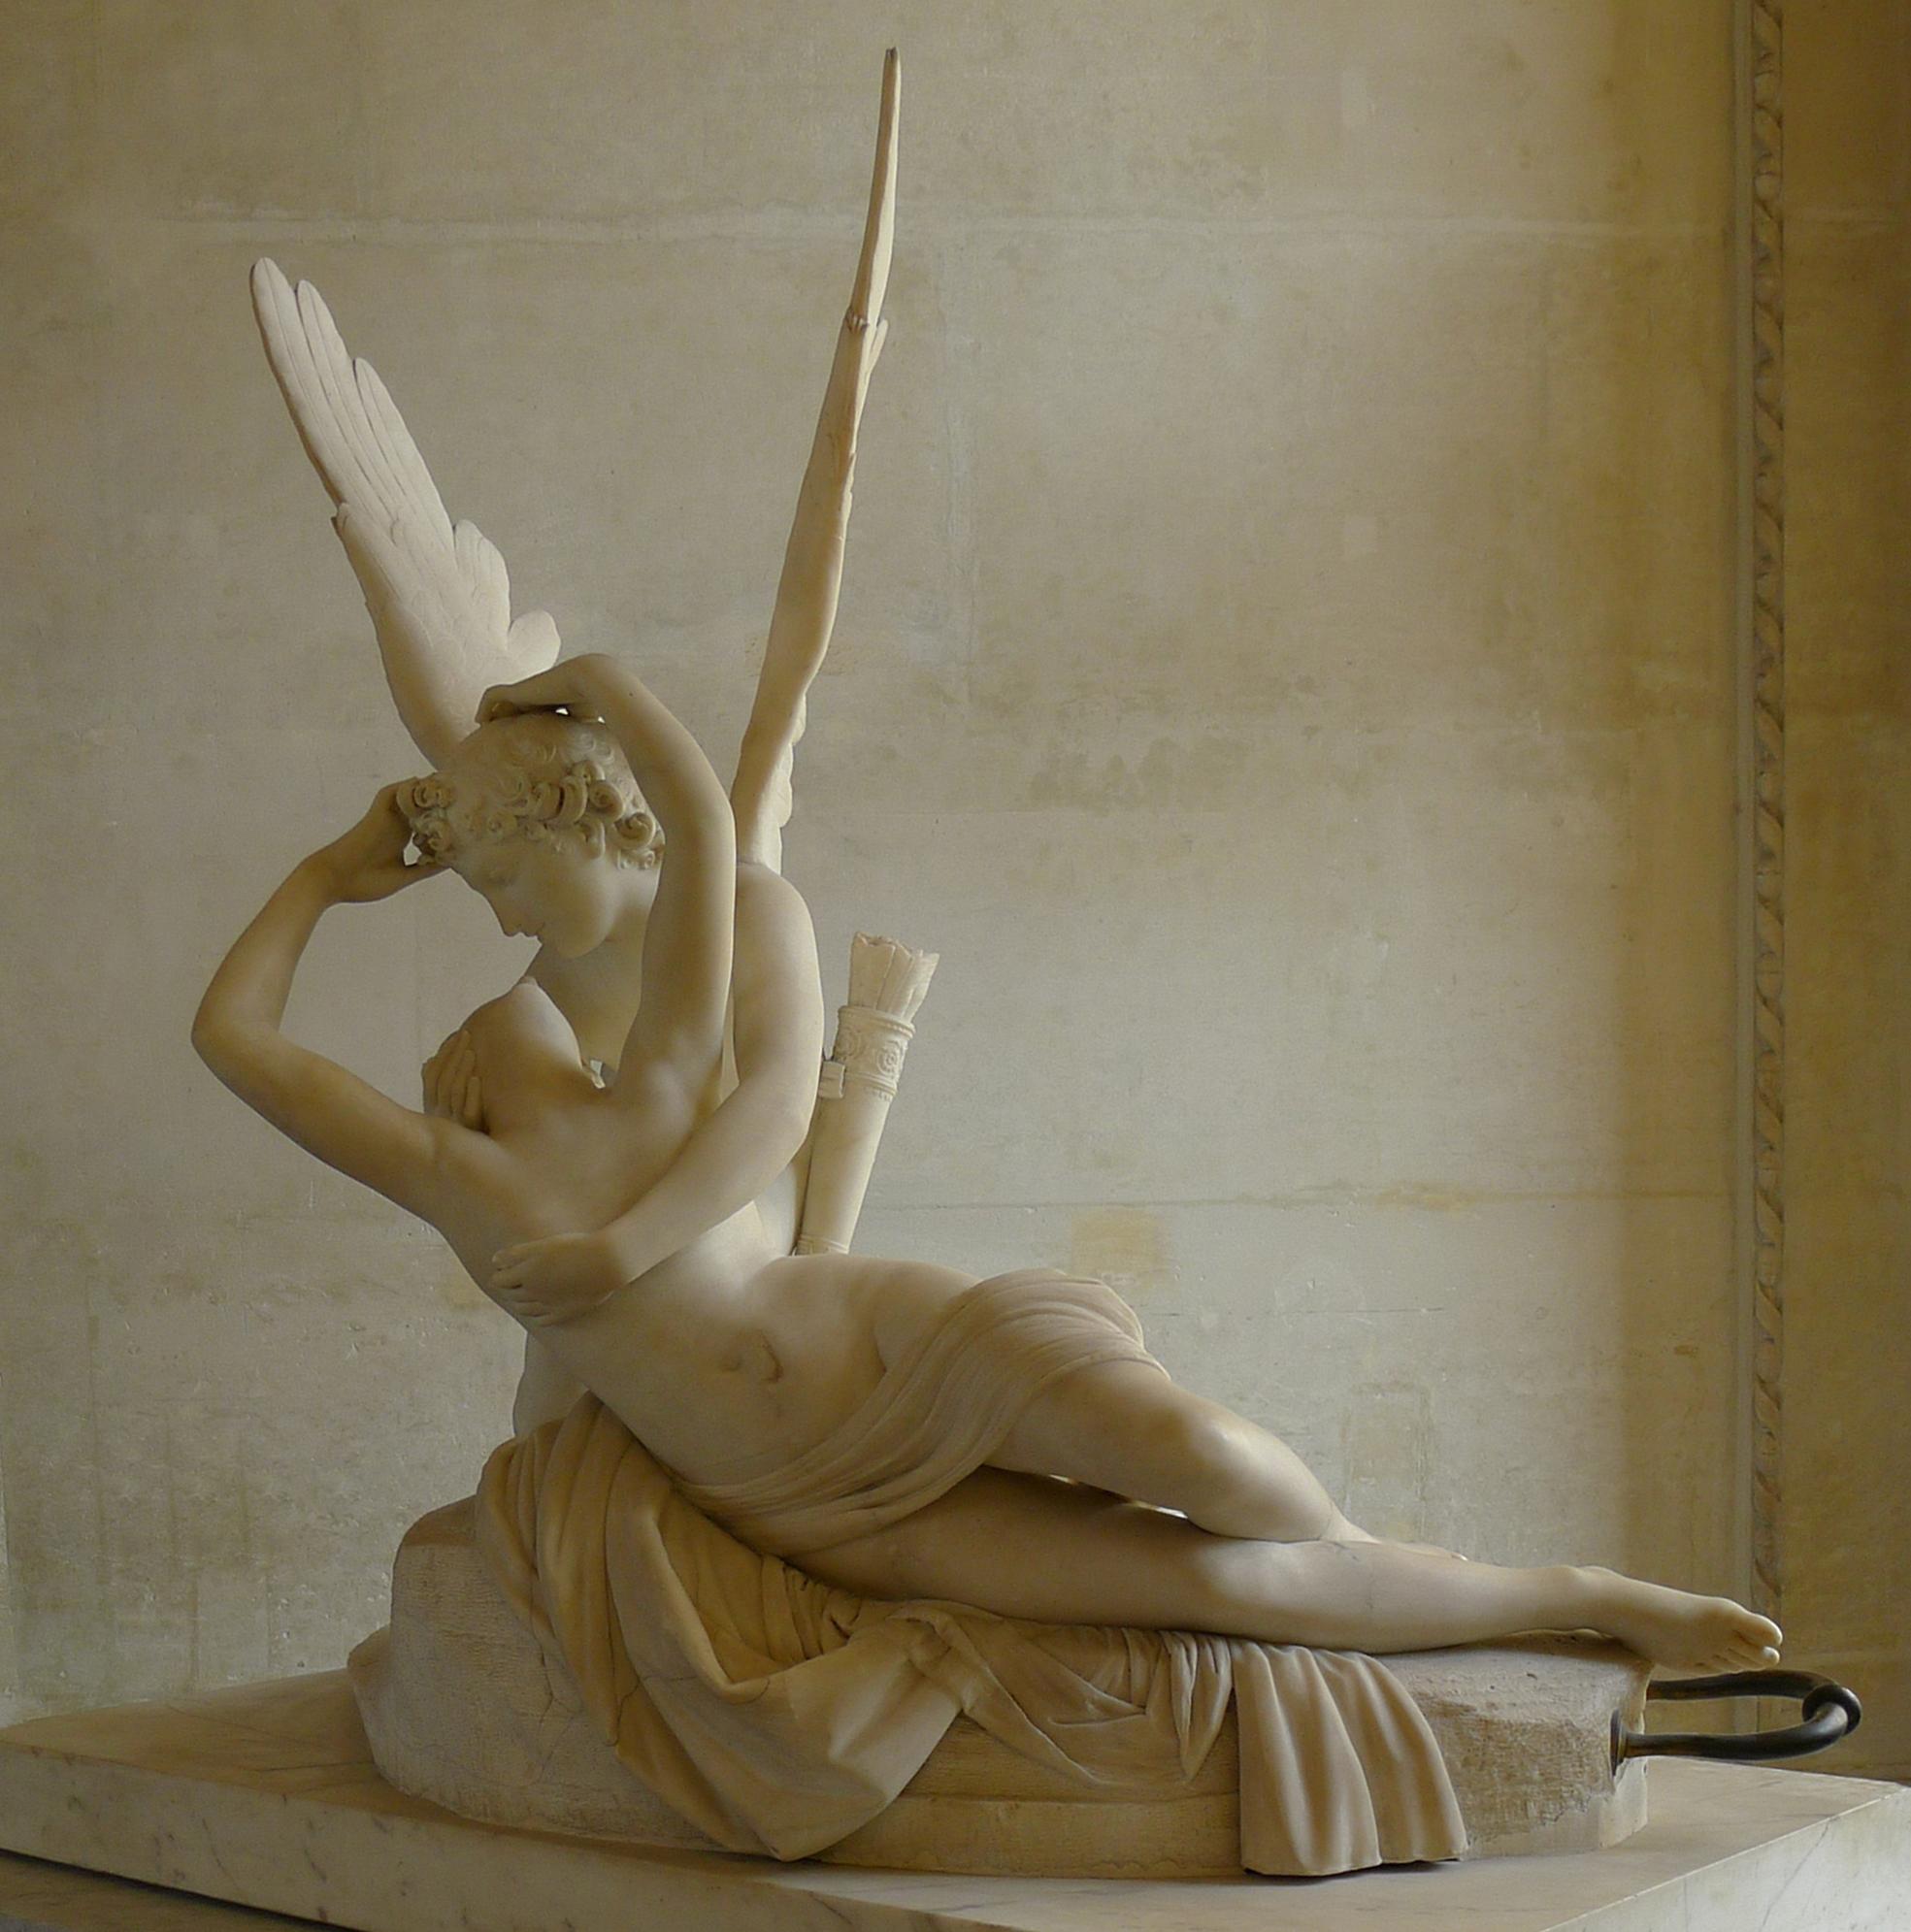 File:Amor-Psyche-Canova-JBU01 JPG - Wikimedia Commons